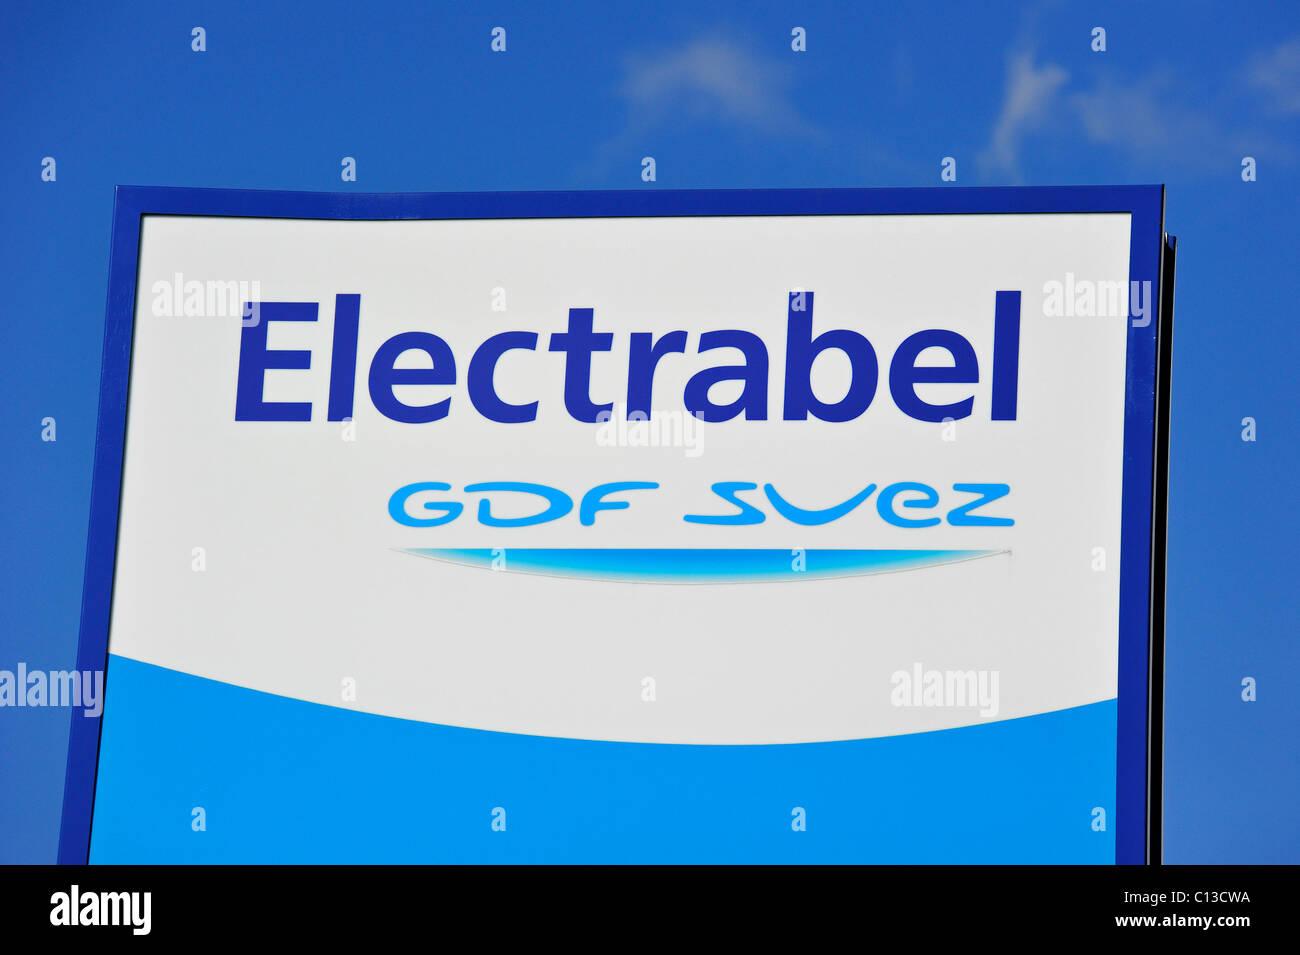 Sign of energy corporation Electrabel, Ghent, Belgium - Stock Image